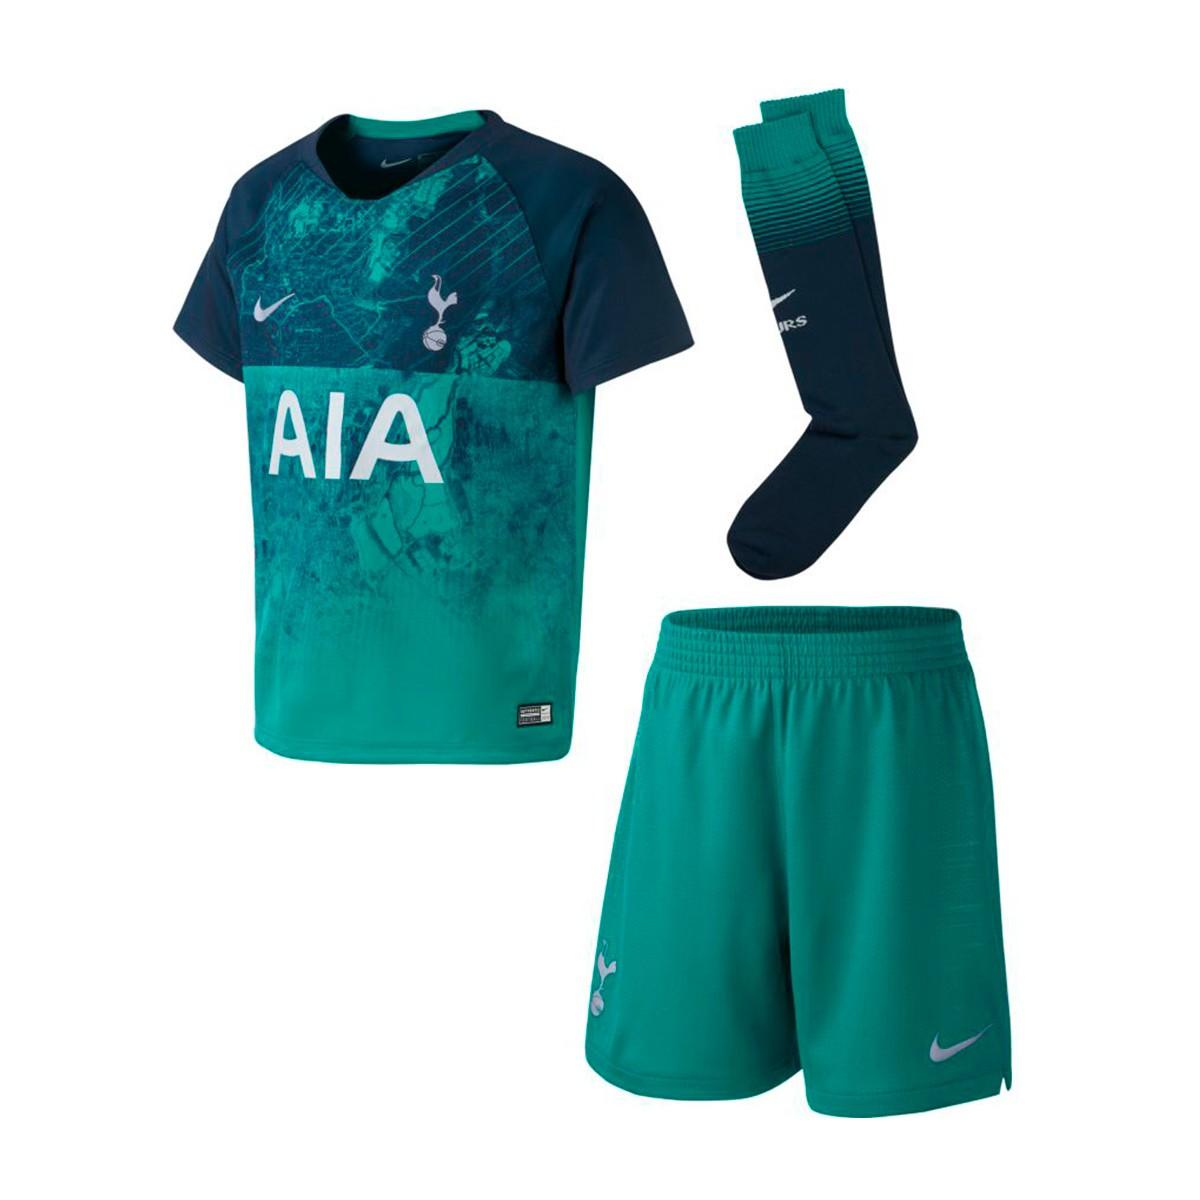 0e57bec9c08b3 Conjunto Nike Tottenham Hotspur FC Tercera Equipación 2018-2019 Niño  Neptune green-Armory navy - Tienda de fútbol Fútbol Emotion